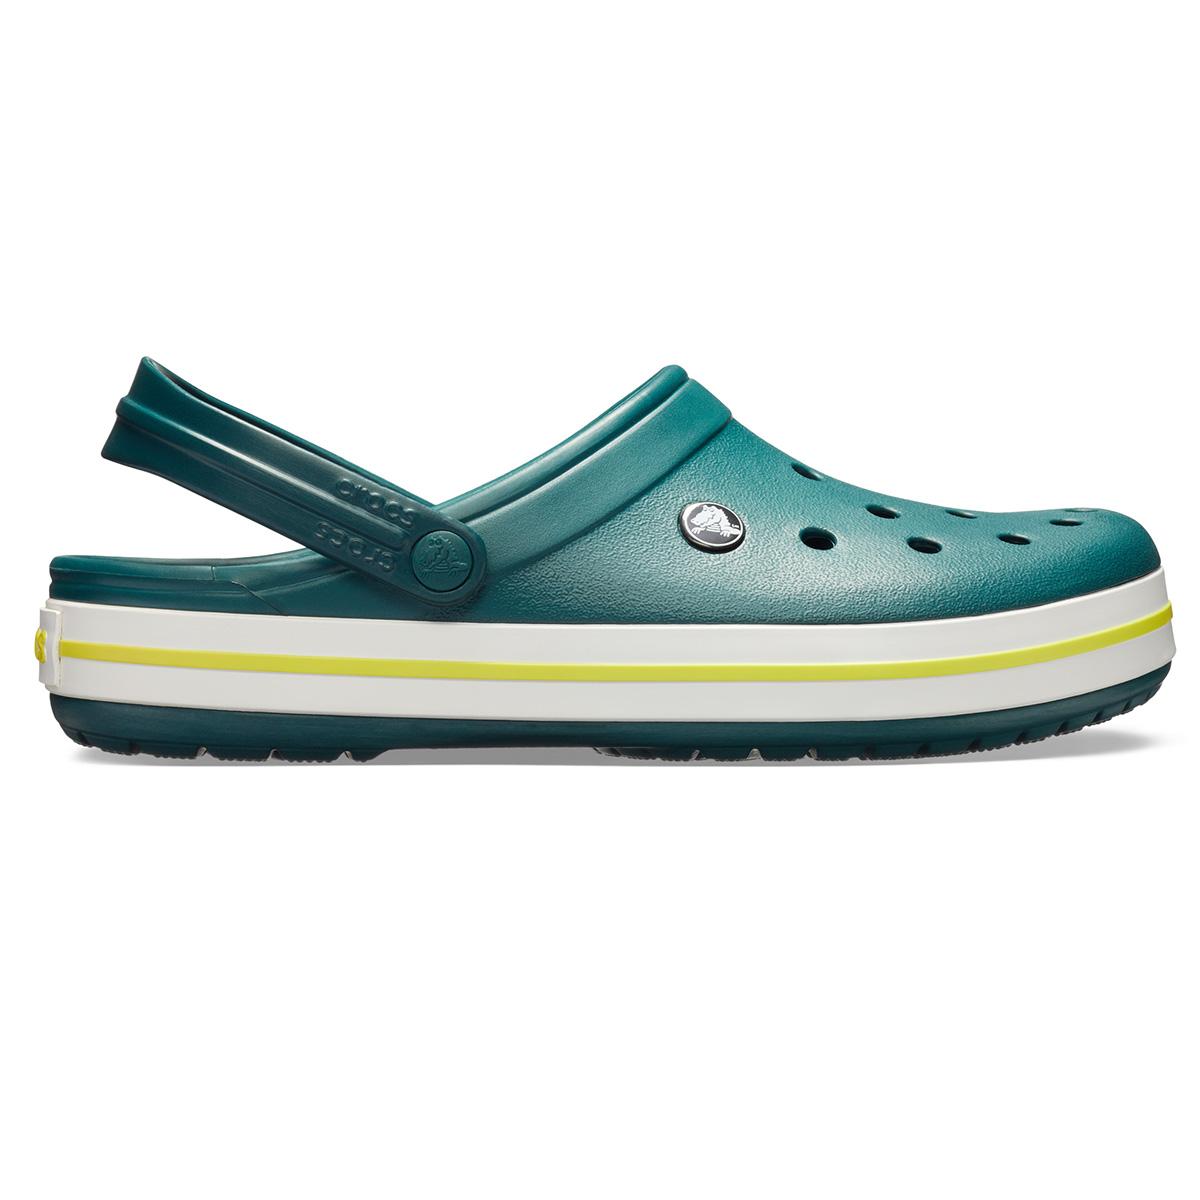 Crocs Crocband - Çam Yeşili/Tenis Topu Yeşili